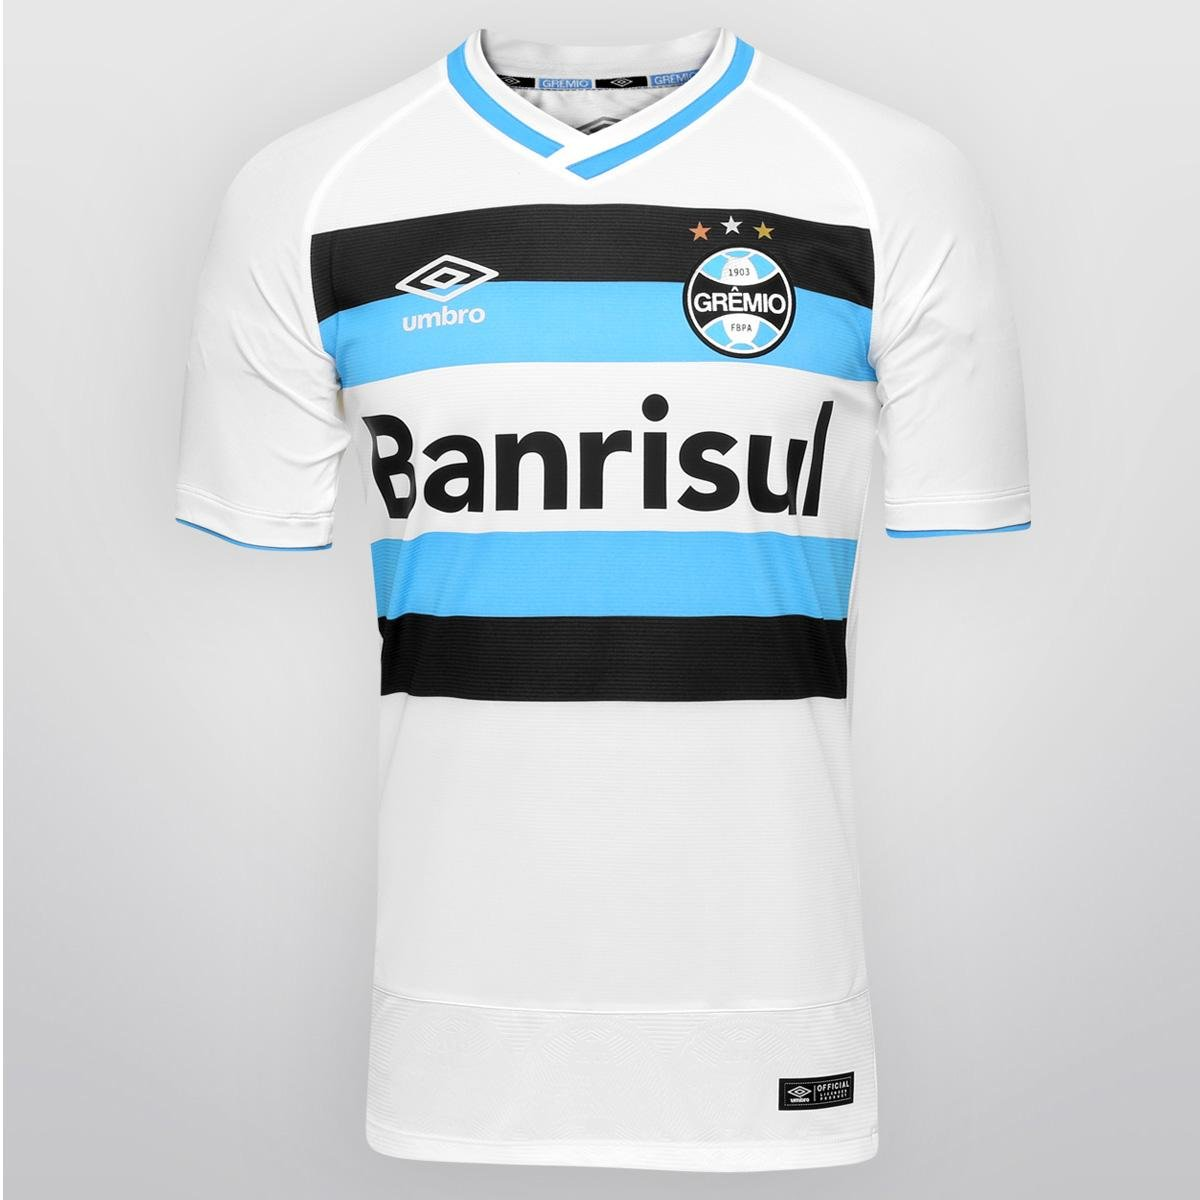 107ed64164 Camisa Umbro Grêmio II 2016 s/nº - Jogador | Netshoes